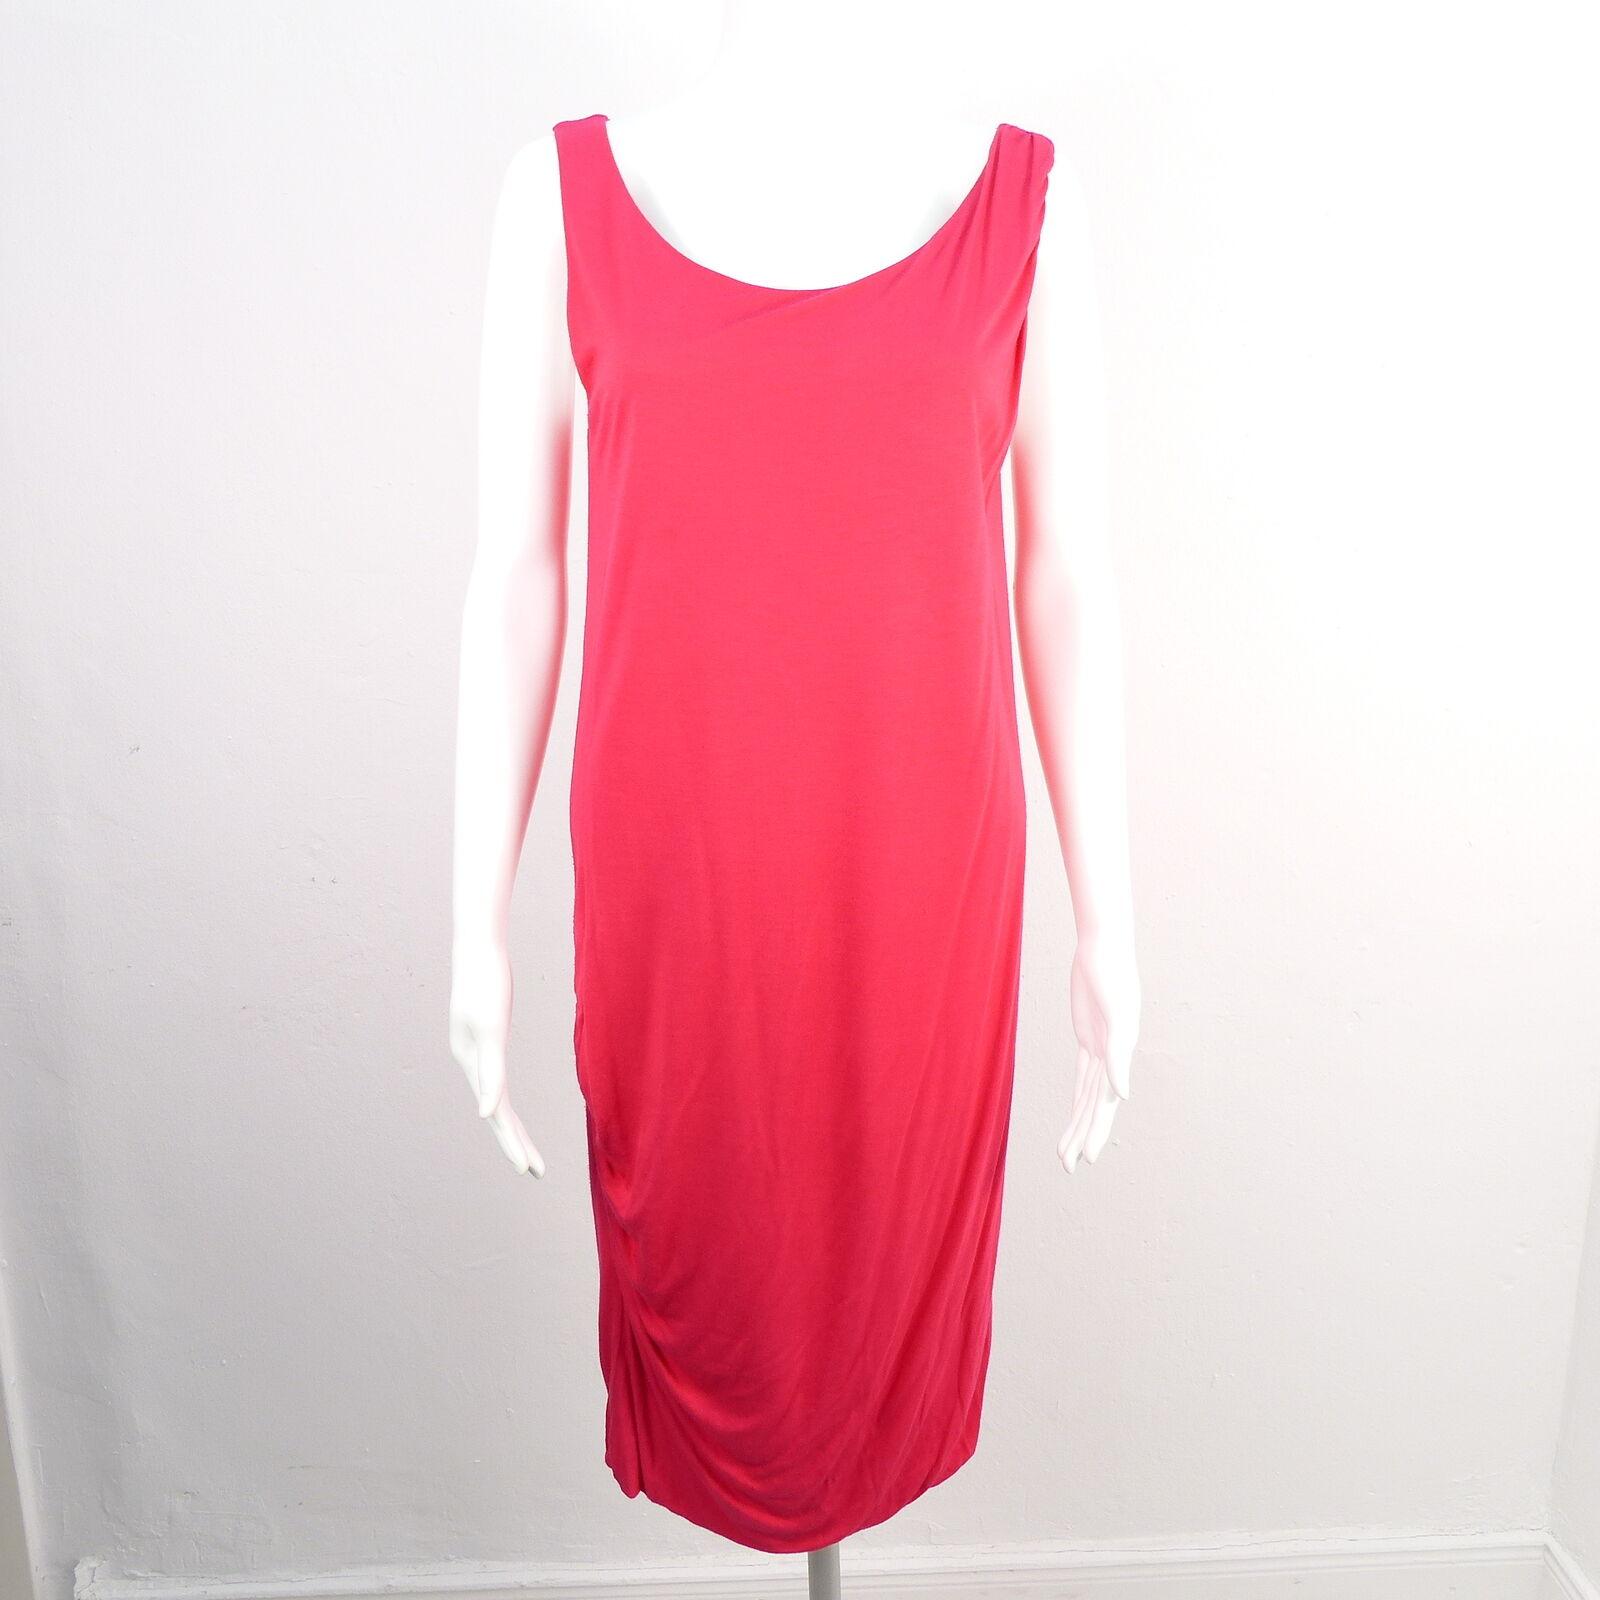 MARC CAIN Kleid Gr. DE 38 N3 Rosa Damen Etuikleid Stretch Seidenanteil Ärmellos